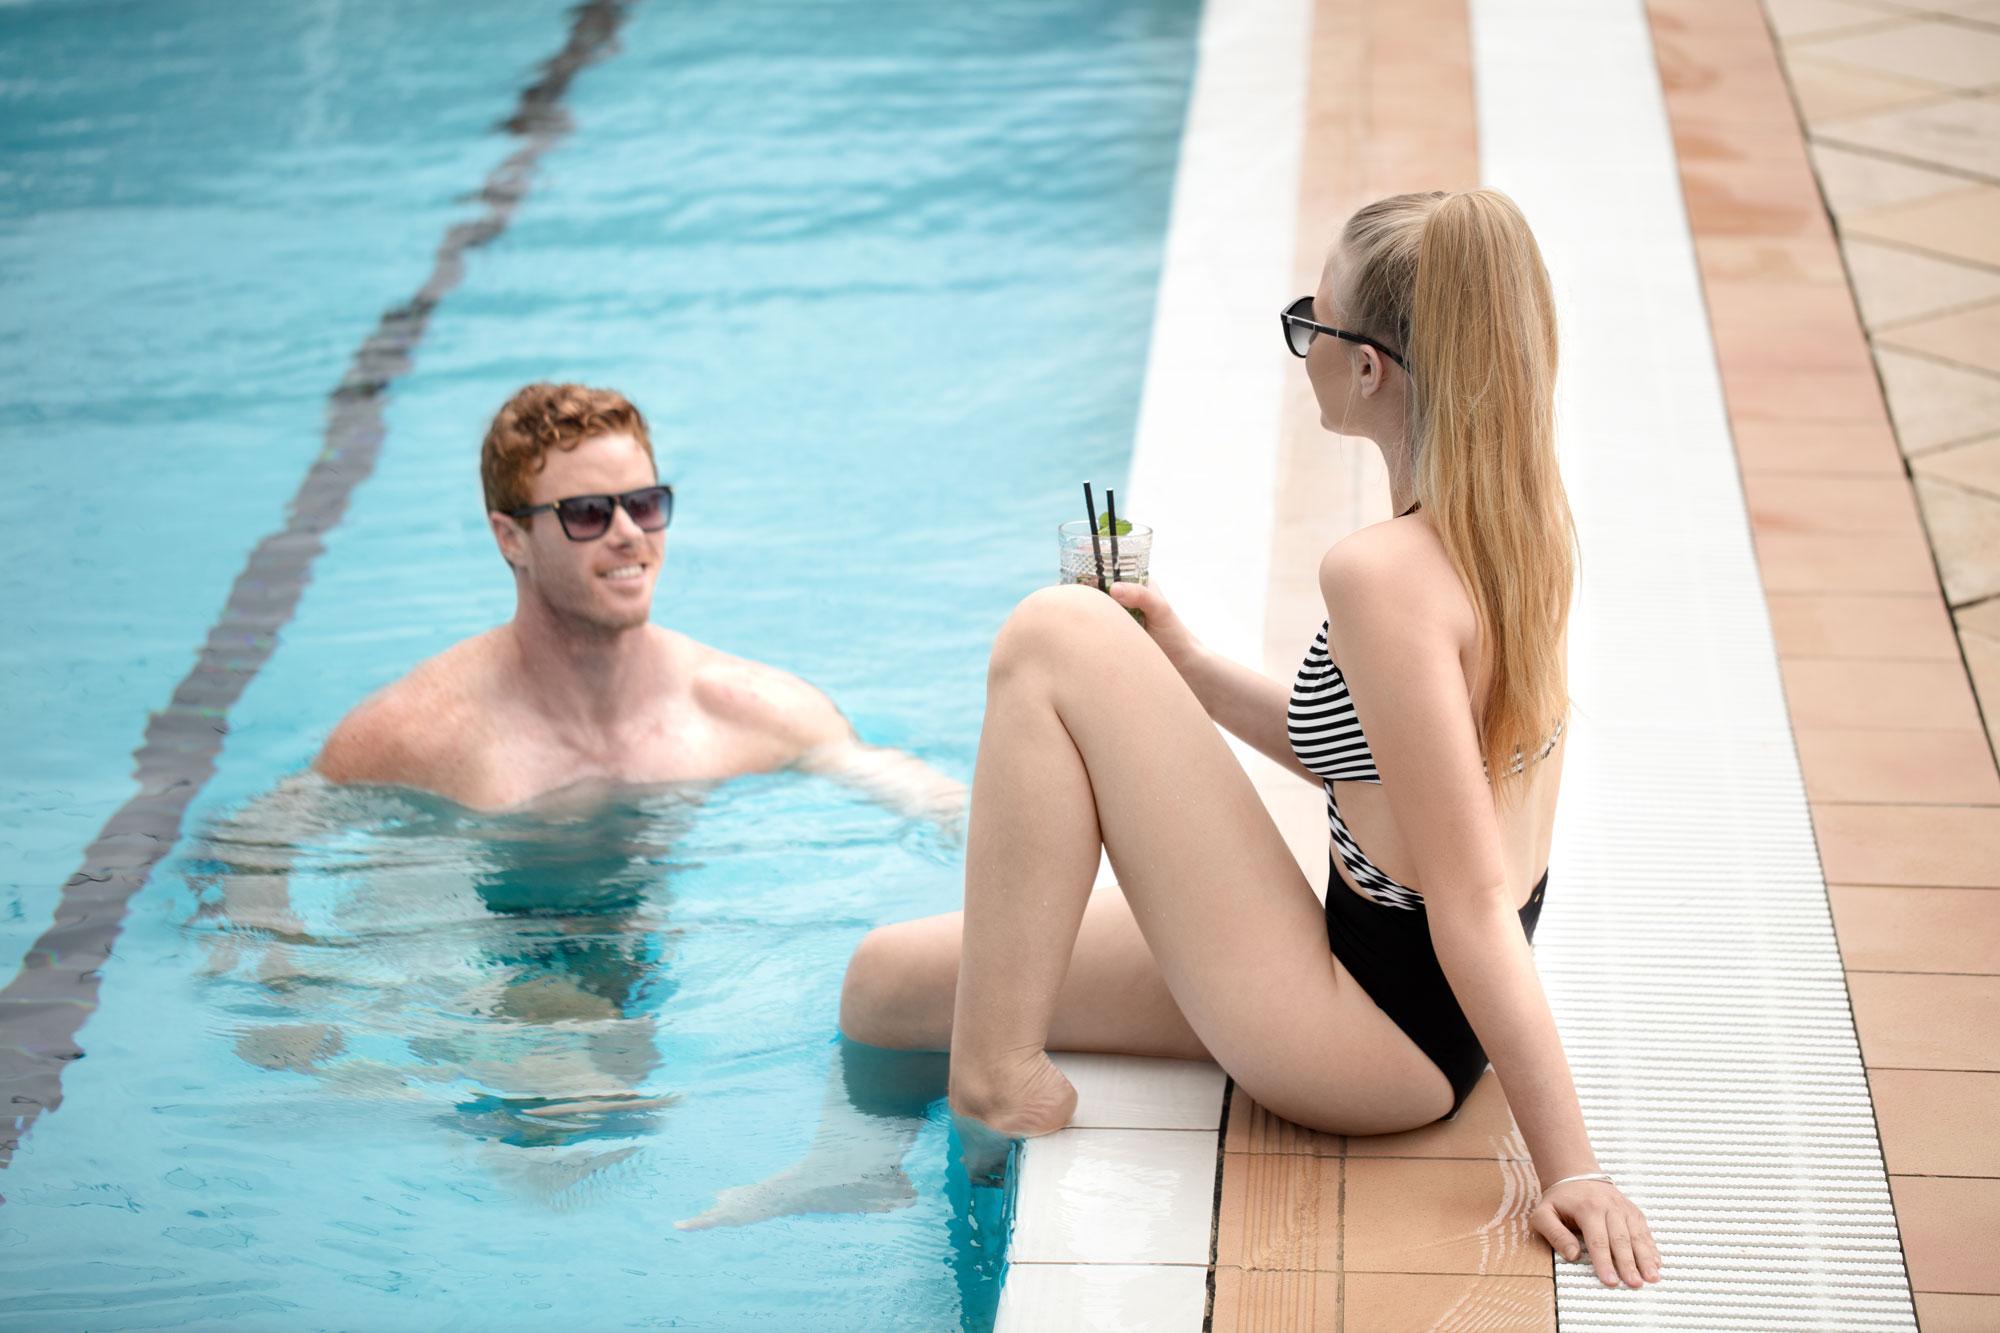 Hotel Summer Lifestyle photography by Adrian Kilchherr Australia Europe Worldwide